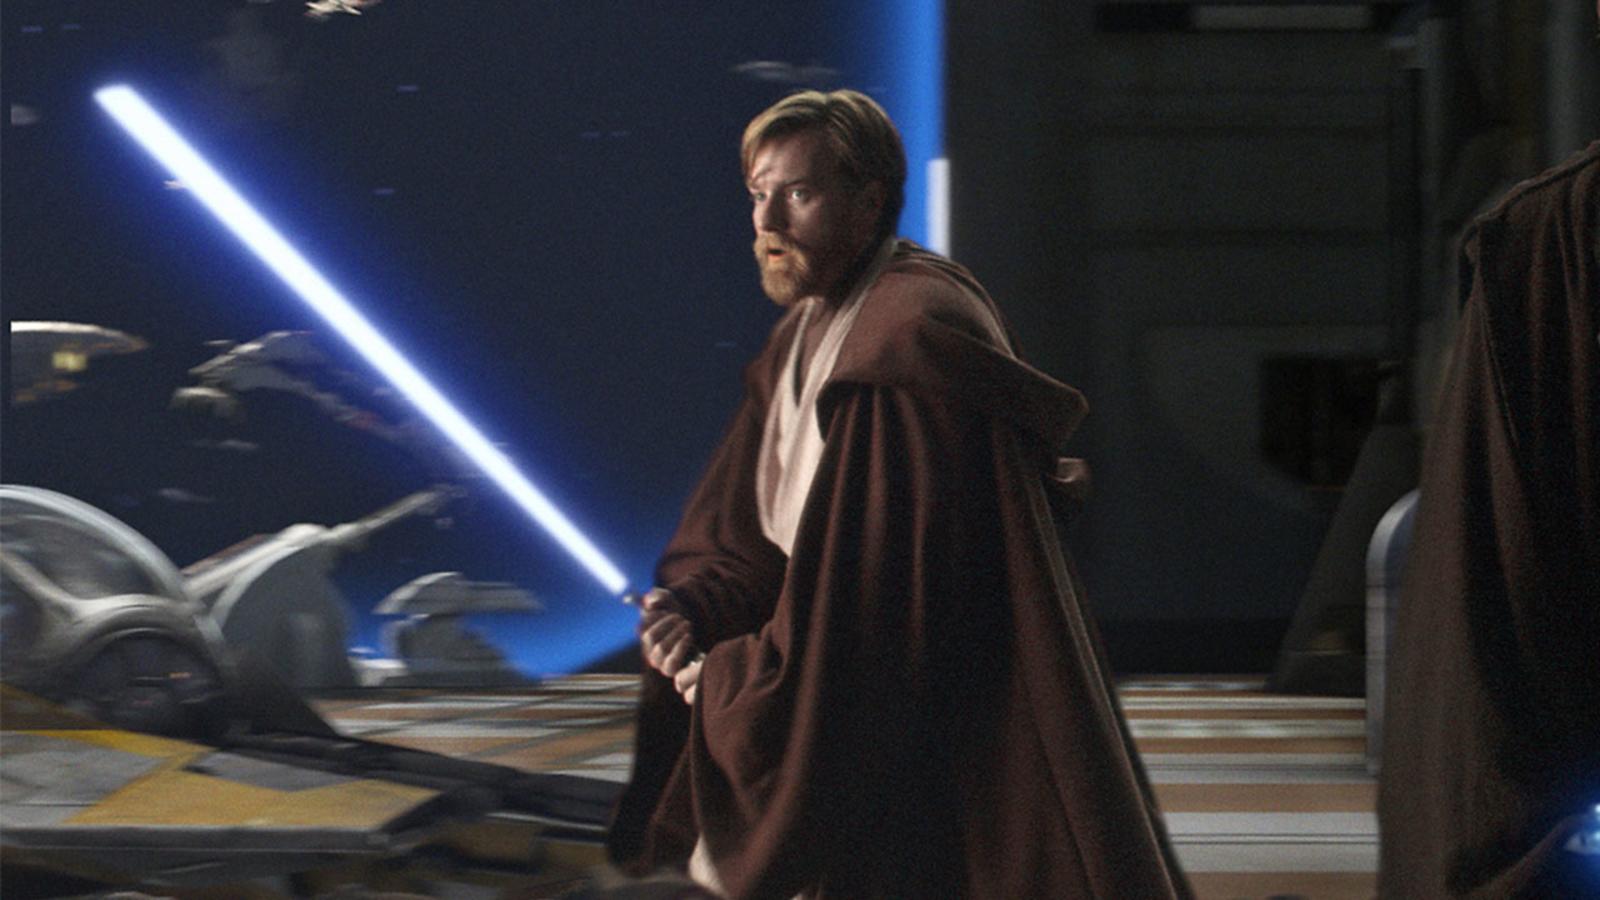 Ewan Mcgregor Obi Wan Kenobi Series Announced For Disney Streaming Service At D23 2019 Expo Abc7 New York